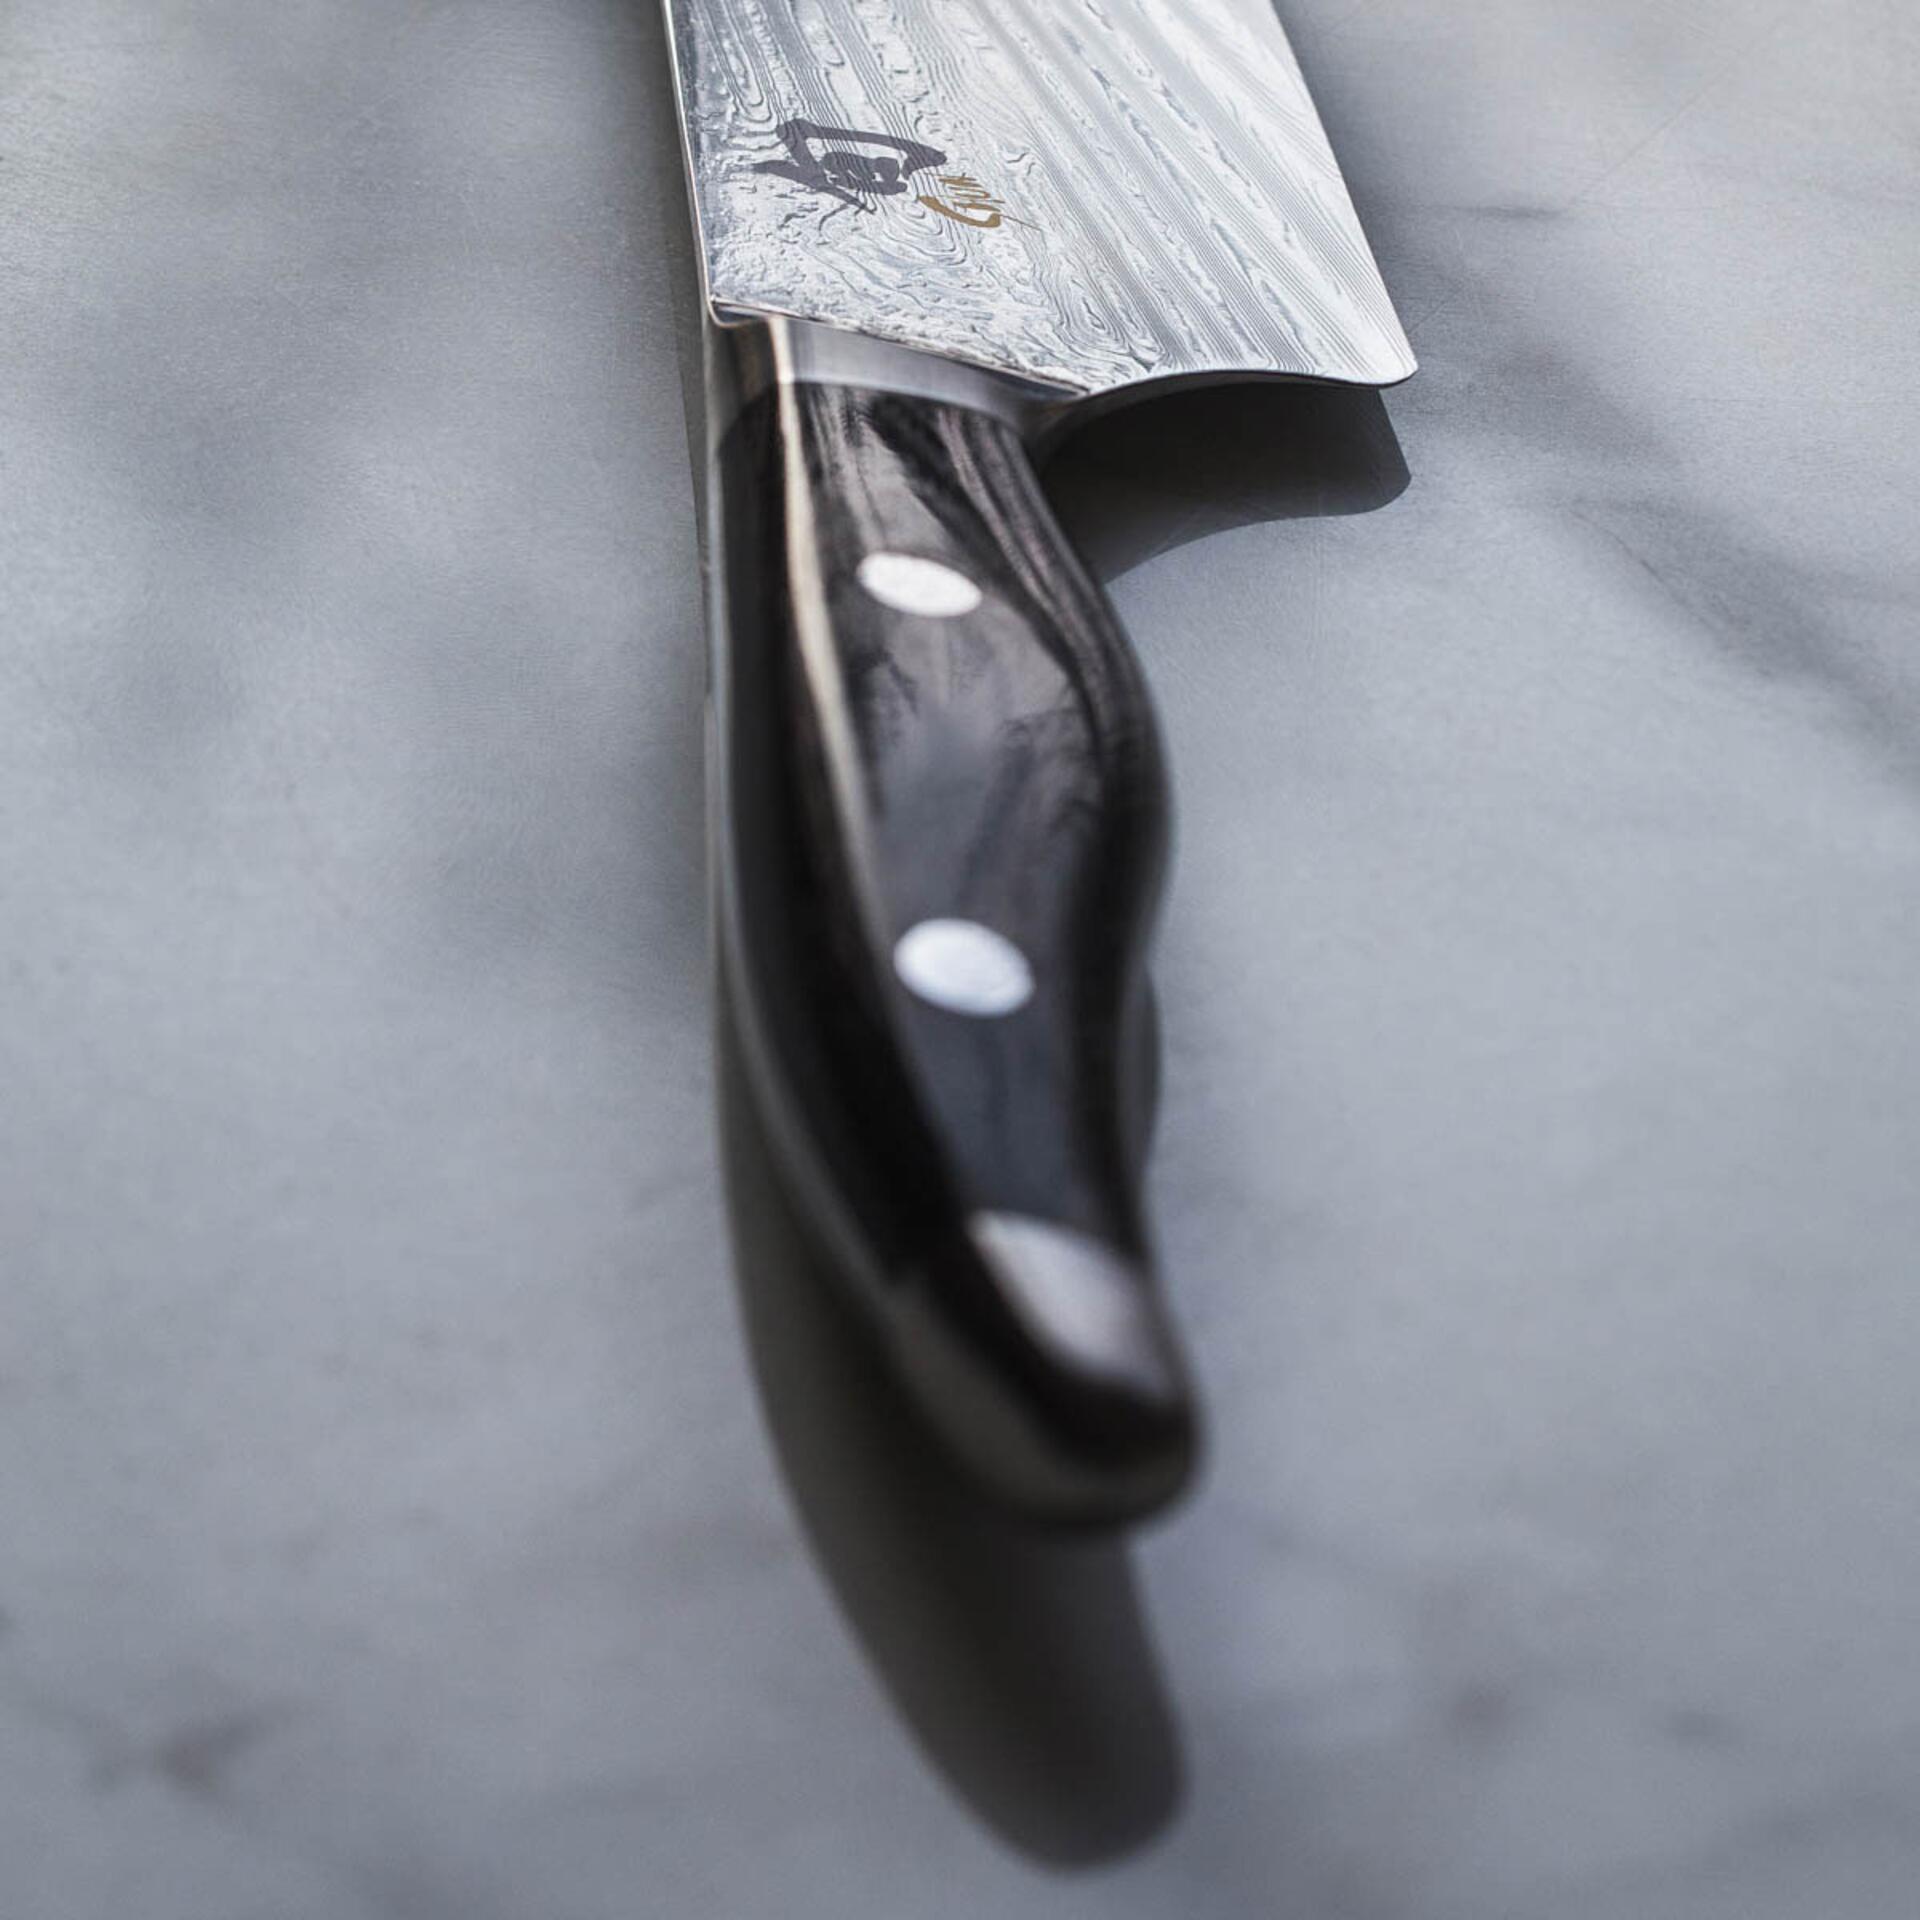 KAI Shun Nagare Brotmesser 23 cm NDC-0705